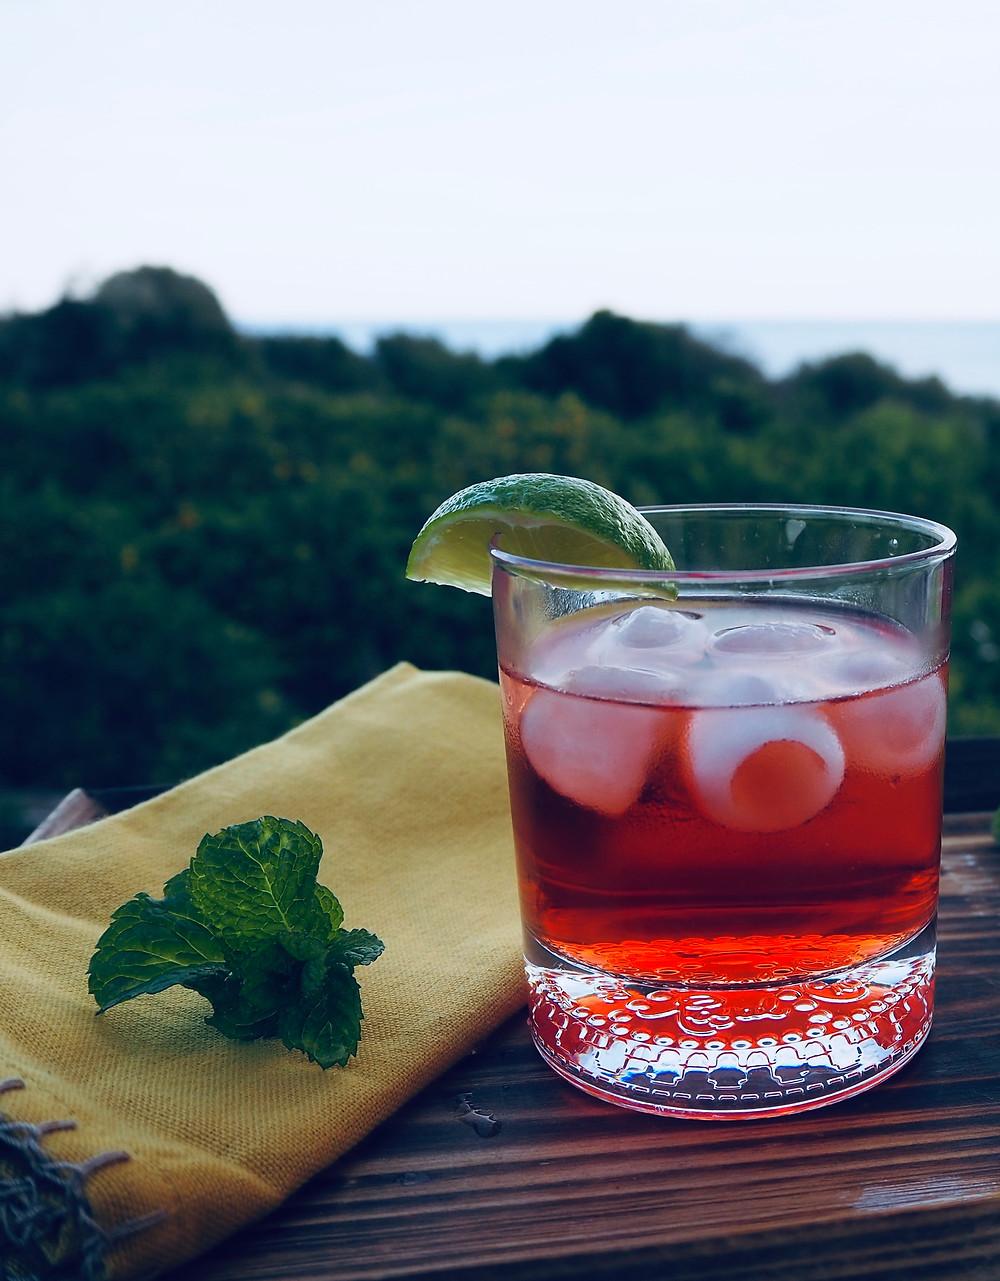 cocktail-recipe-negroni-italian-aperitivo